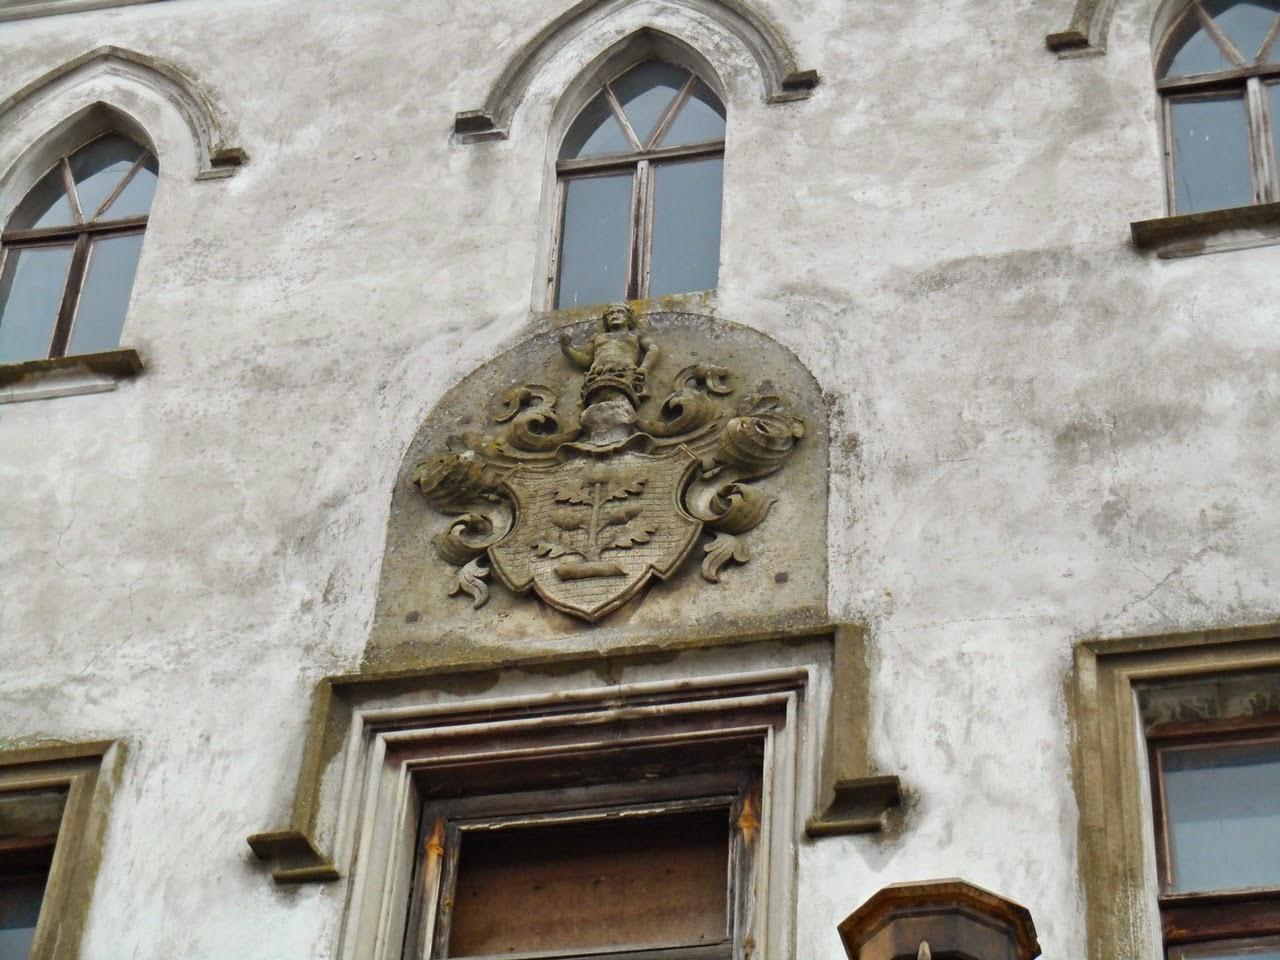 rzeźba, znaki, szlachta, budynek